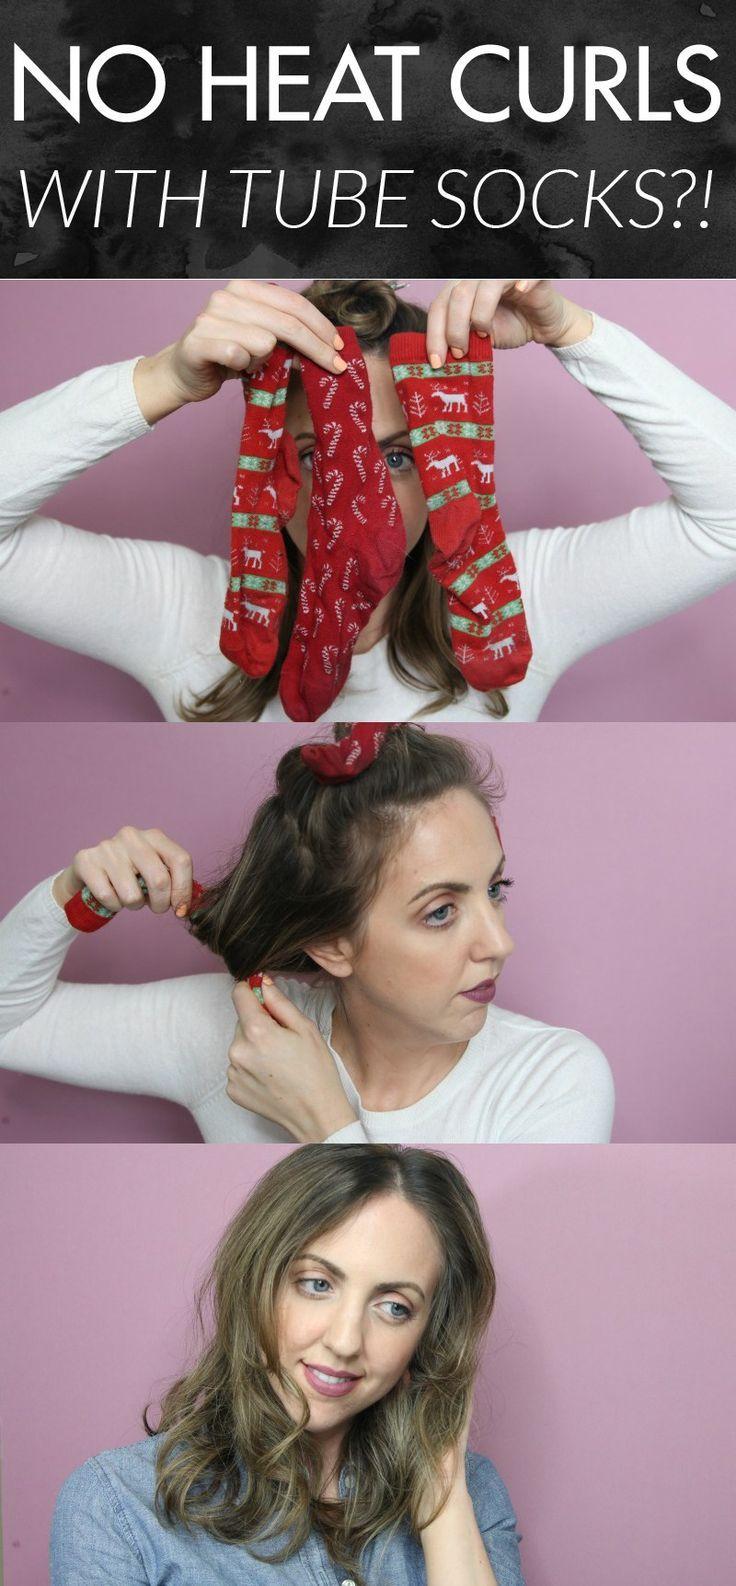 No Heat Curls... With Tube Socks?!